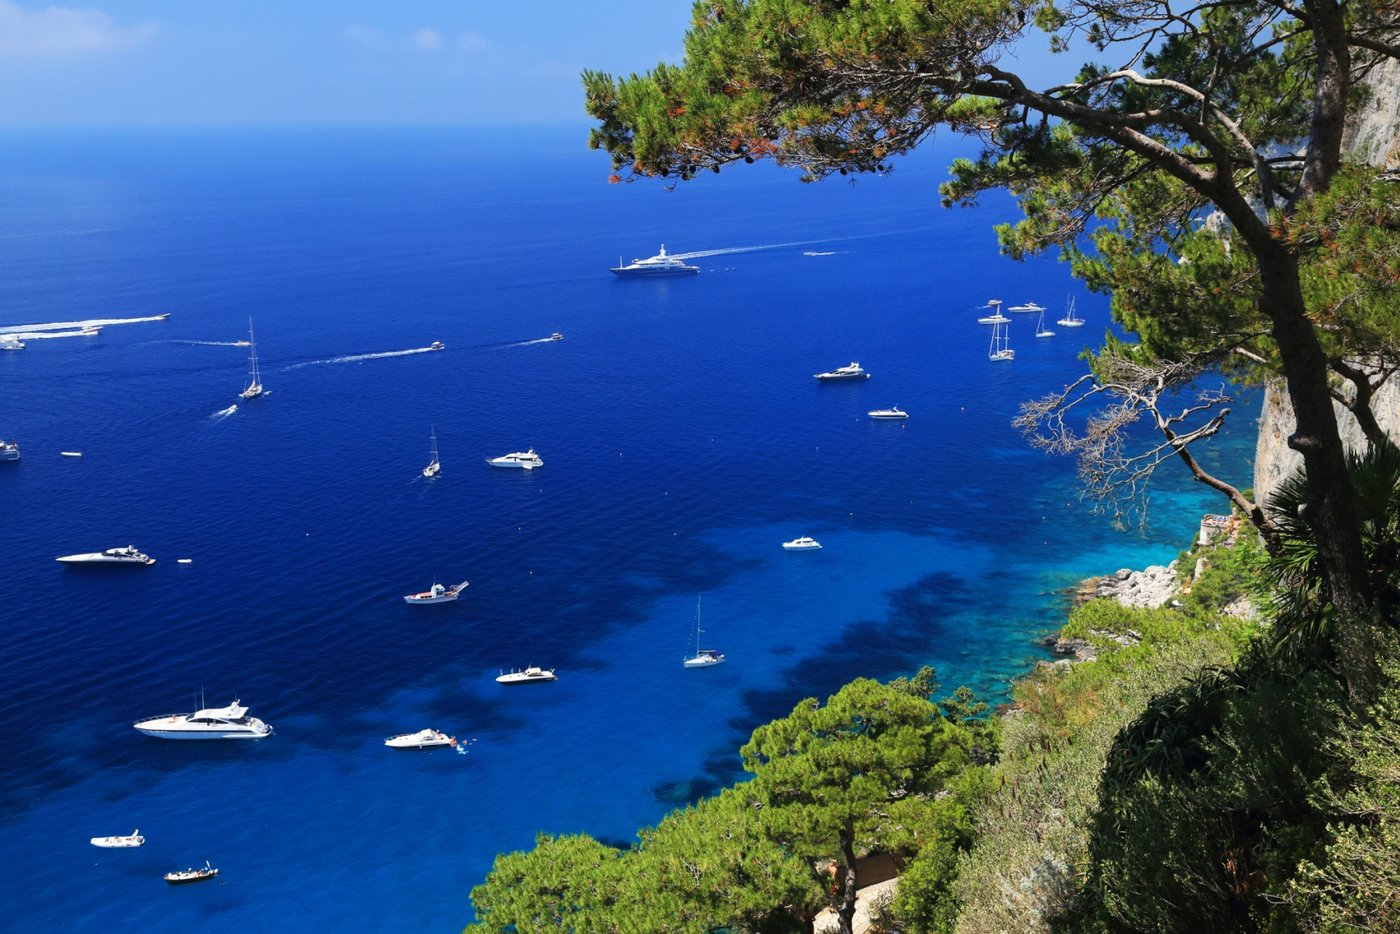 Photo Tour of Amalfi Coast 6